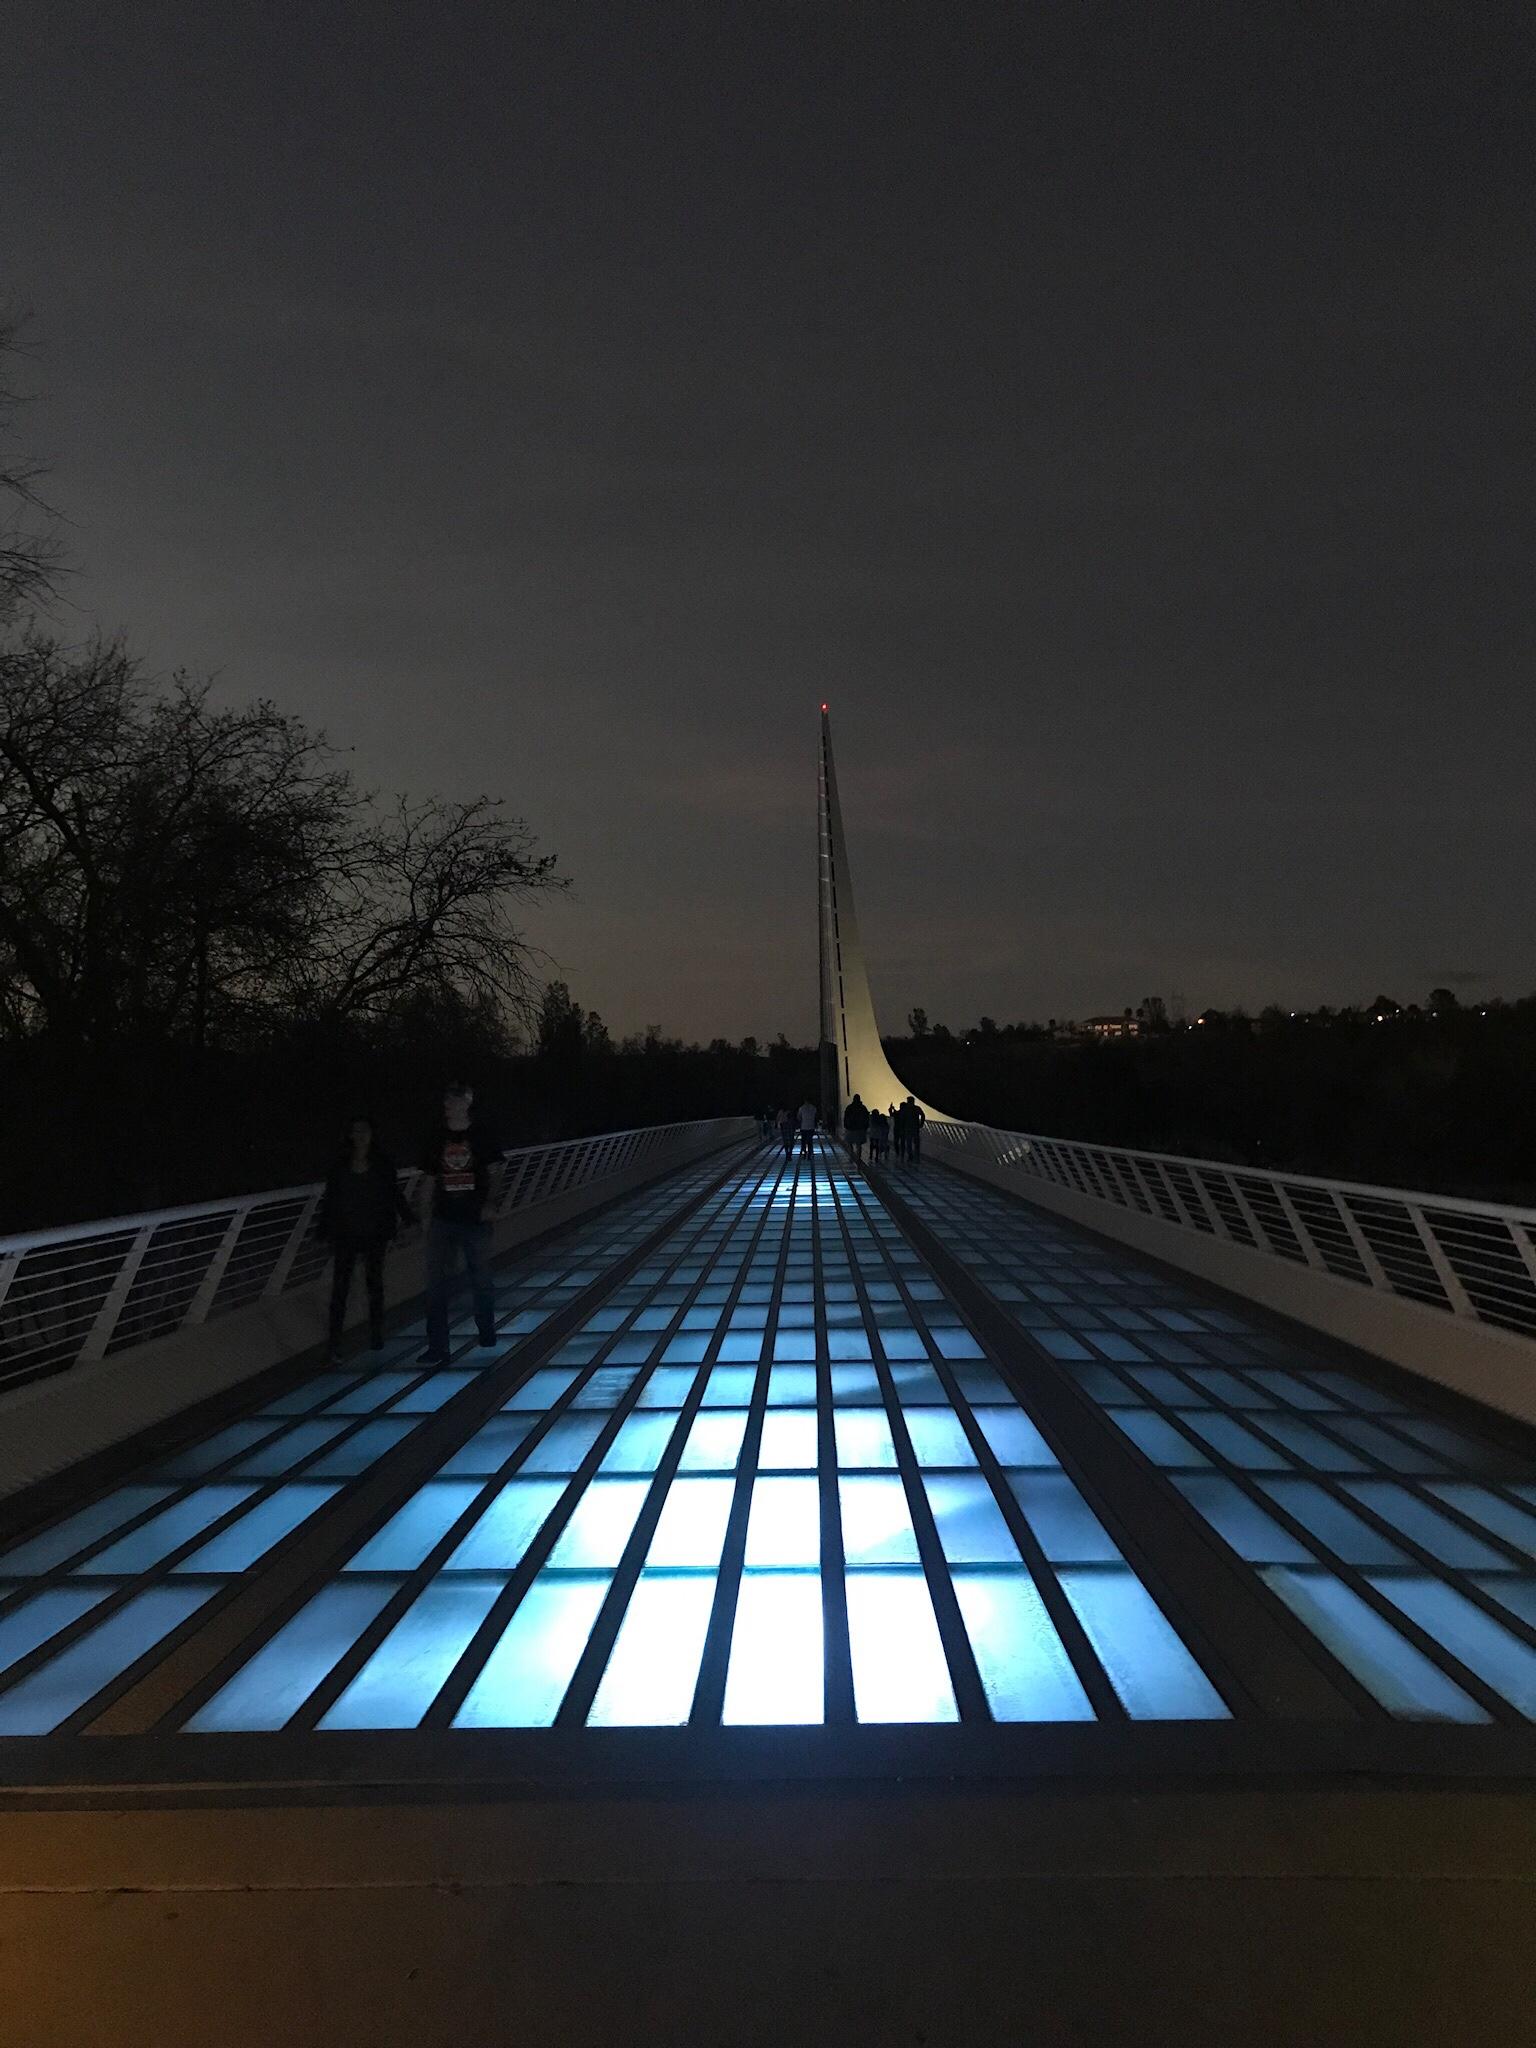 Sundial Bridge deck at night.